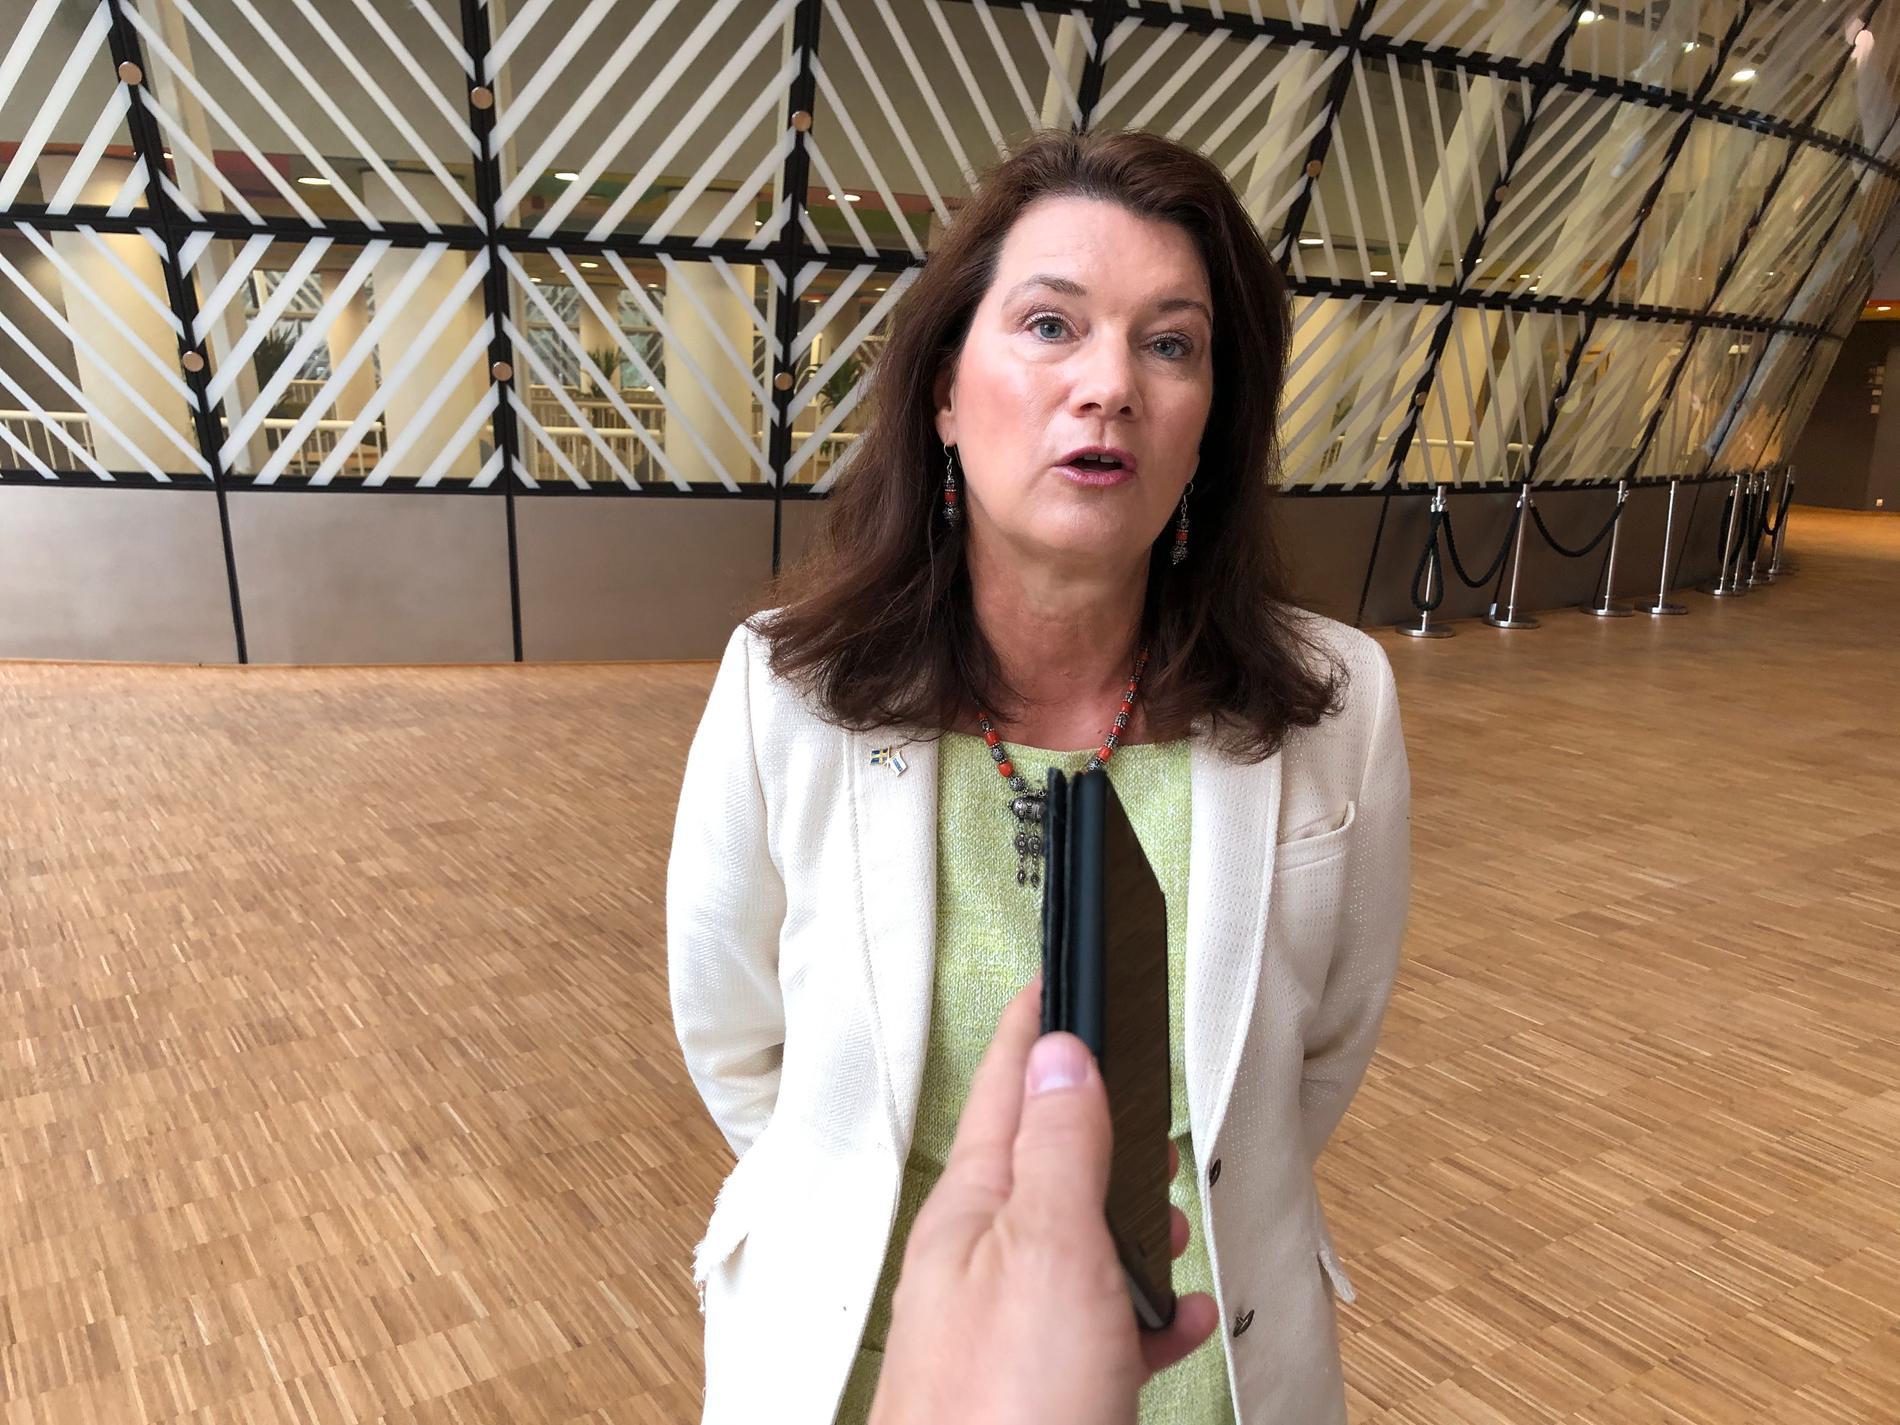 Utrikesminister Ann Linde (S) vid ett utrikesministermöte i Bryssel i juli.